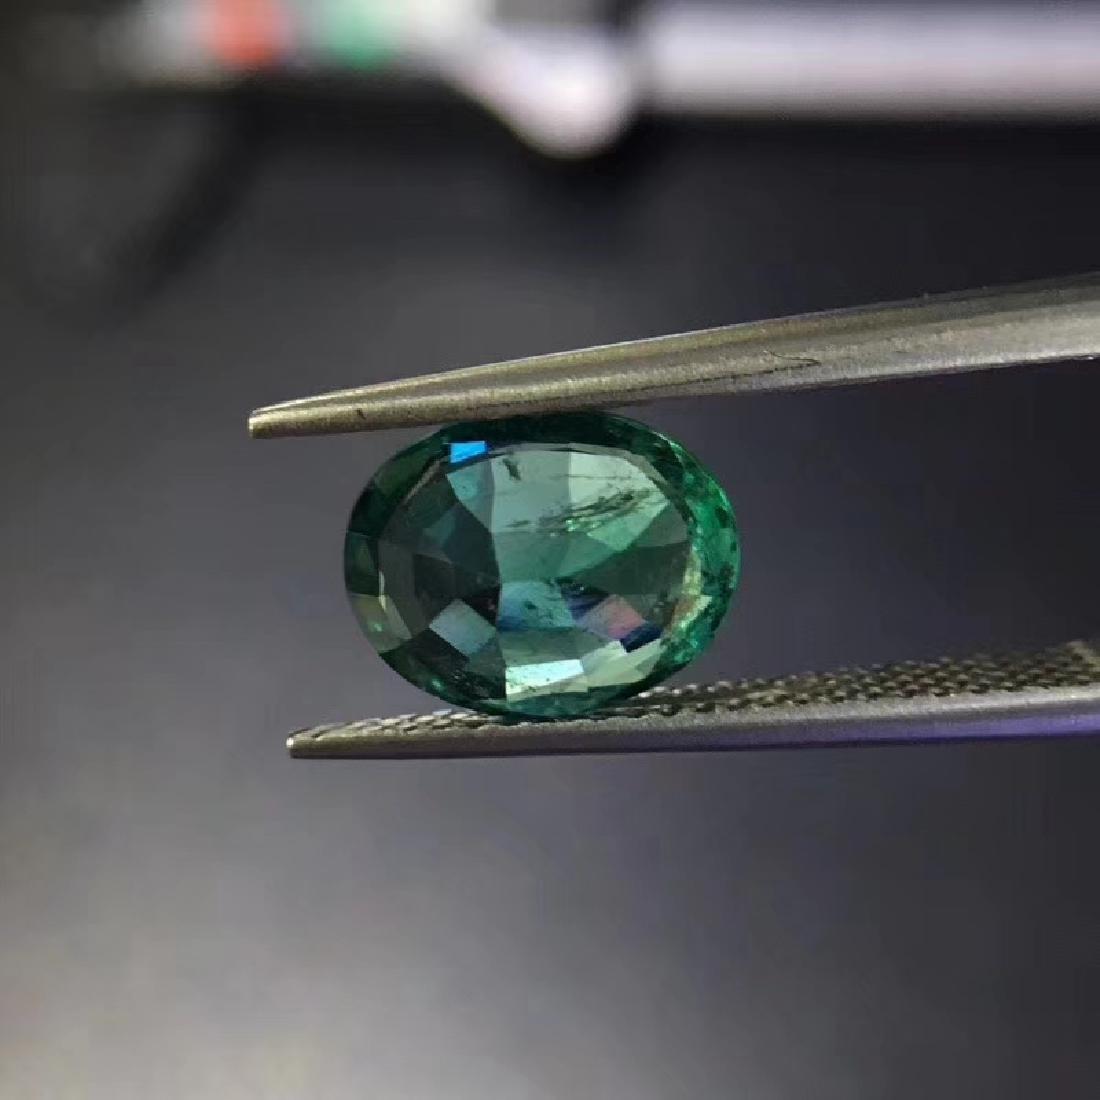 2.04 ct Emerald 7.4*9.4*4.7 mm Oval Cut - 4